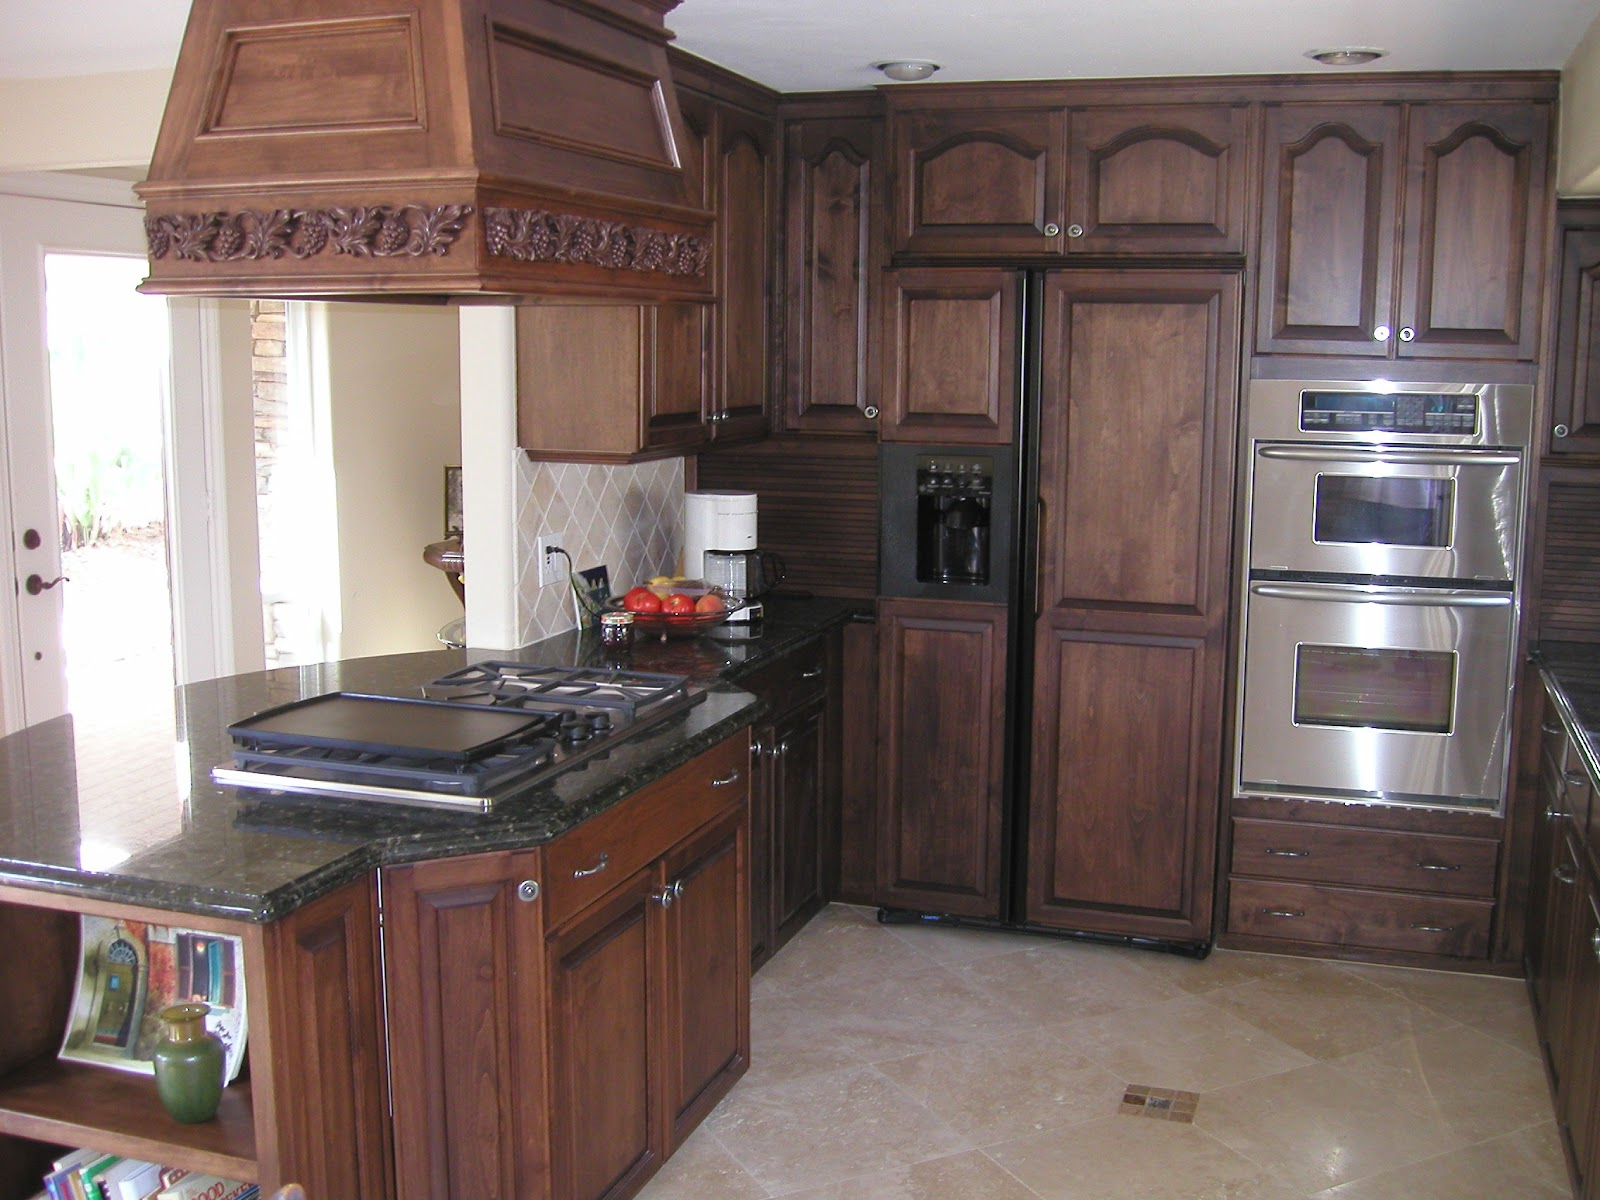 kitchen ideas oak cabinets photo - 3